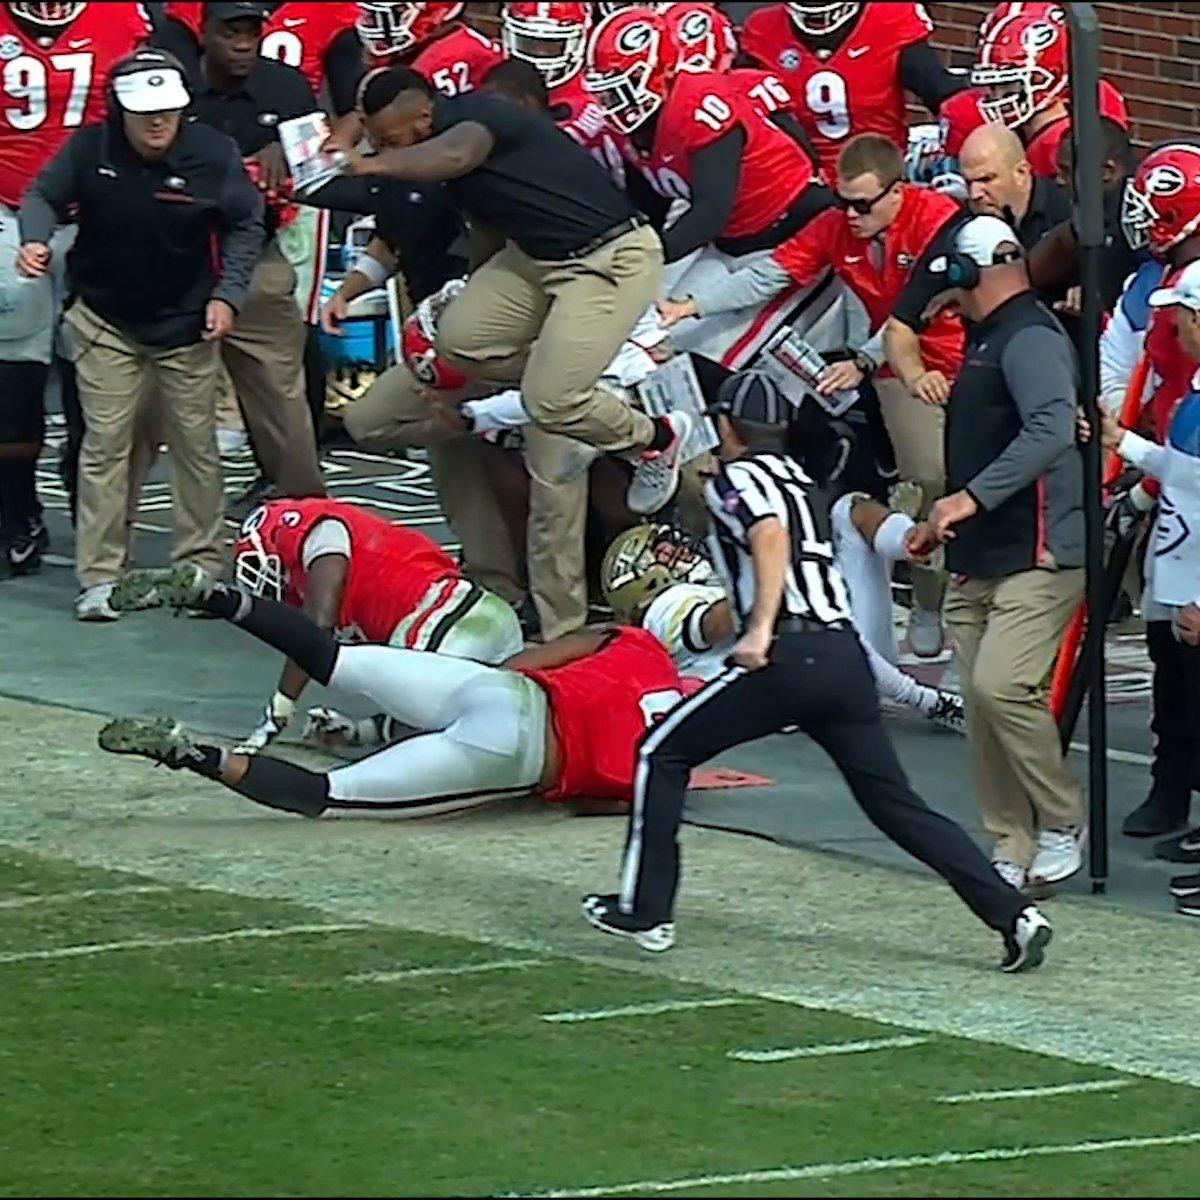 The Georgia coach levitated 😳 https://t.co/YuzrbIphF3